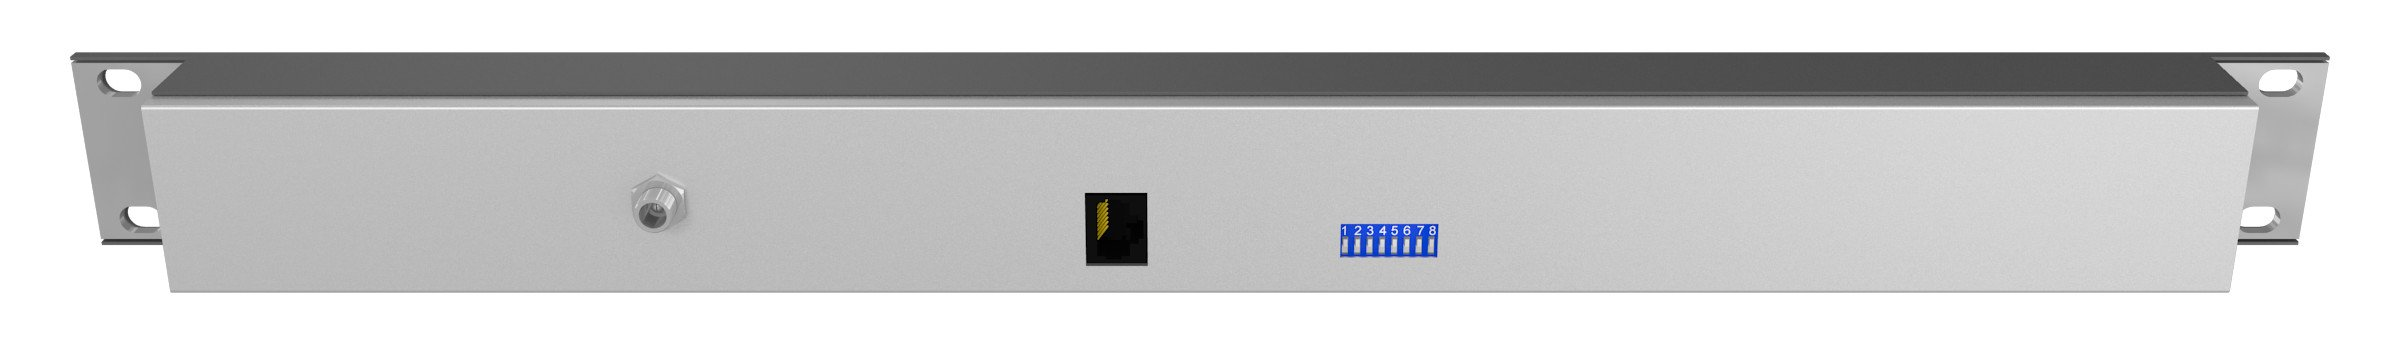 16x16 Elastomeric Remote Button Panel